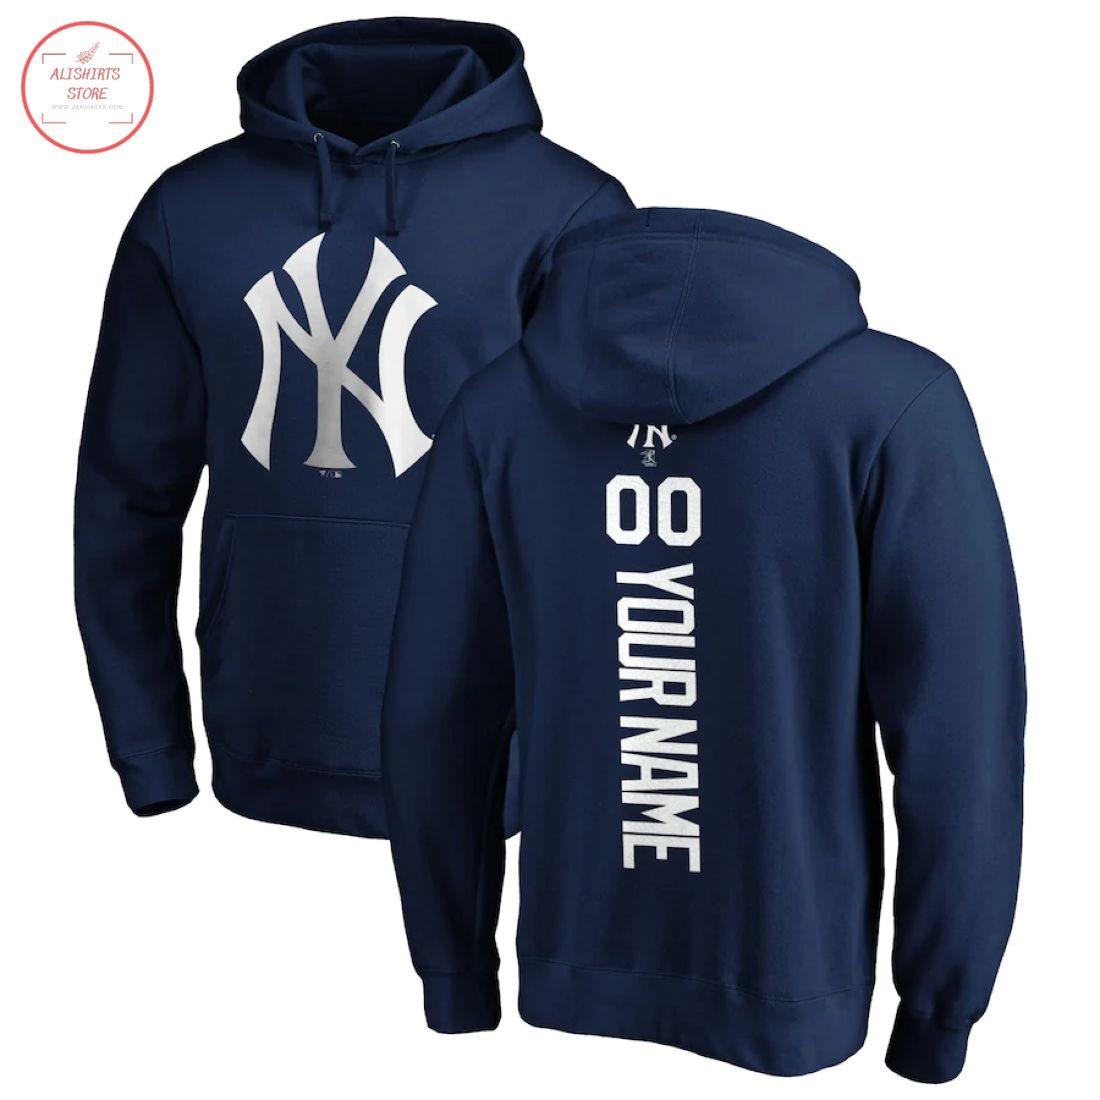 Mlb New York Yankees Personalized Hoodie